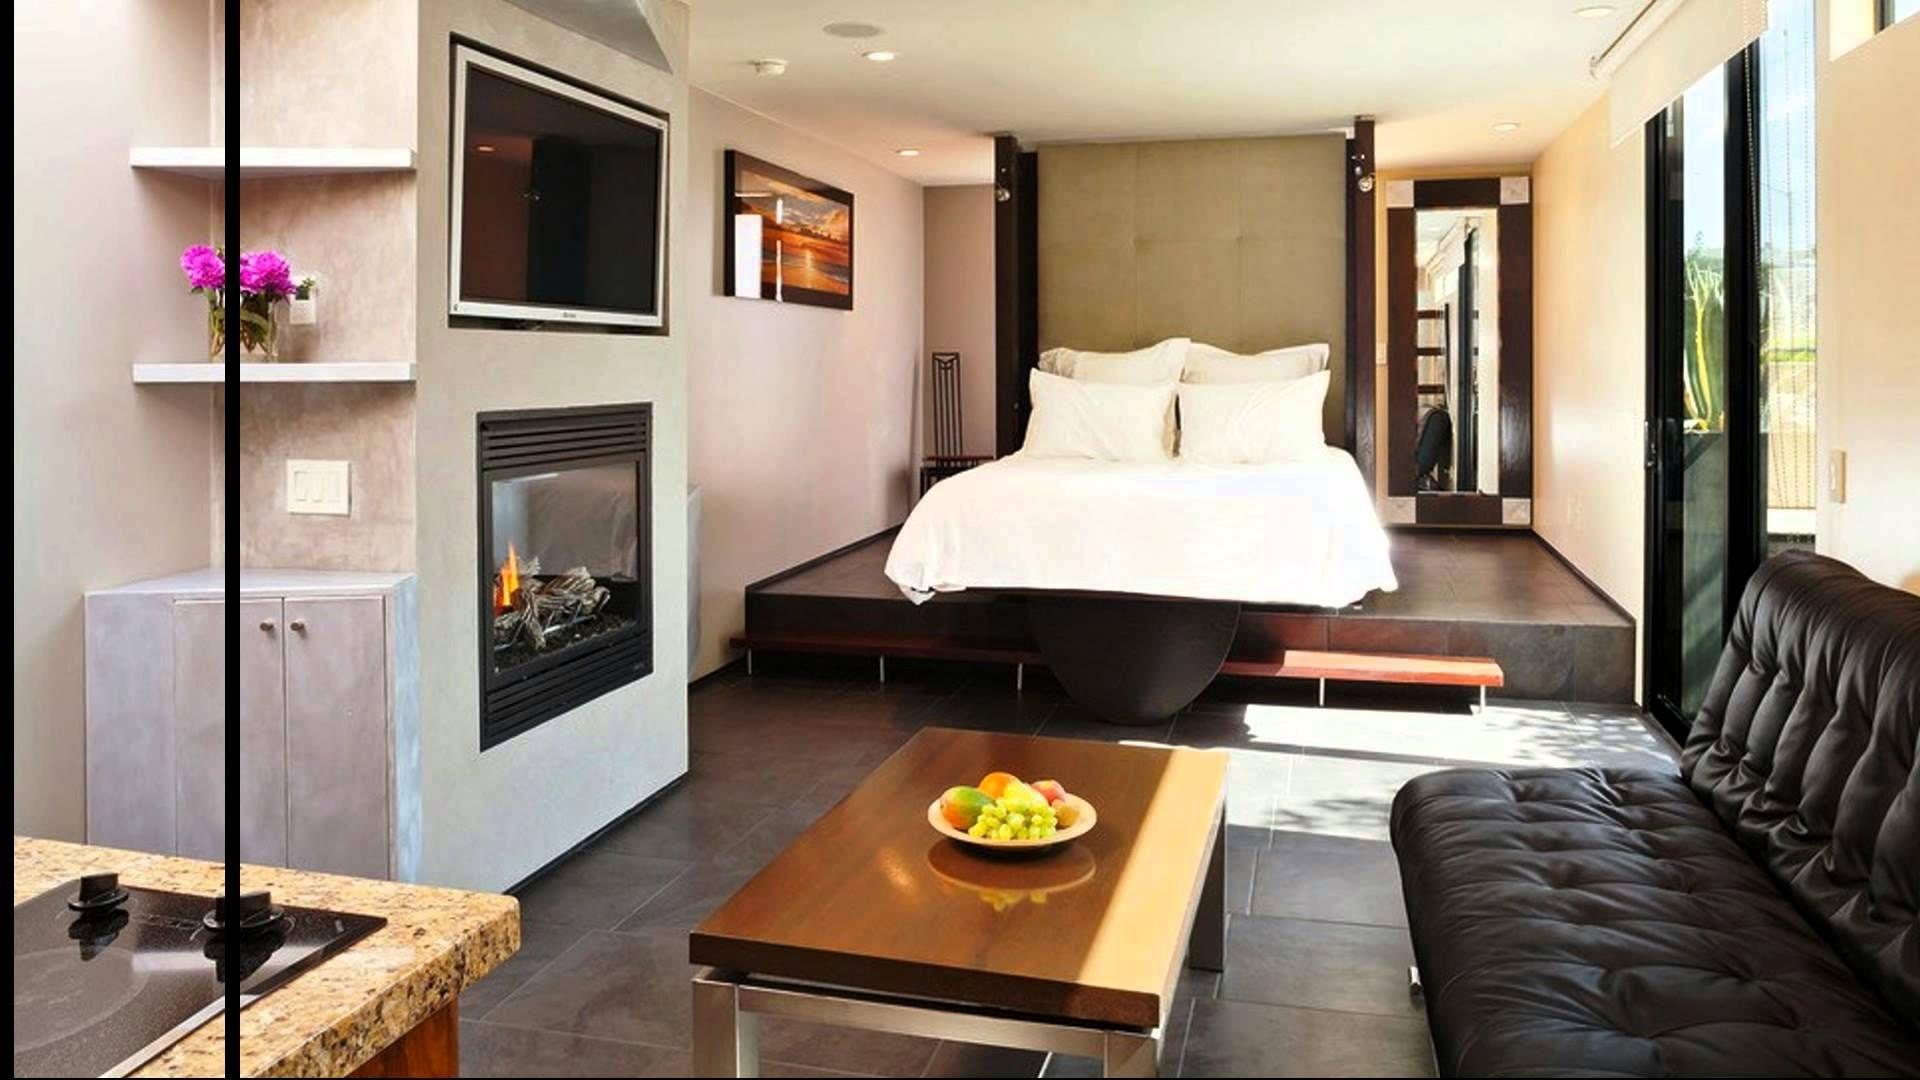 36 Creative Studio Apartment Design Ideas One bedroom